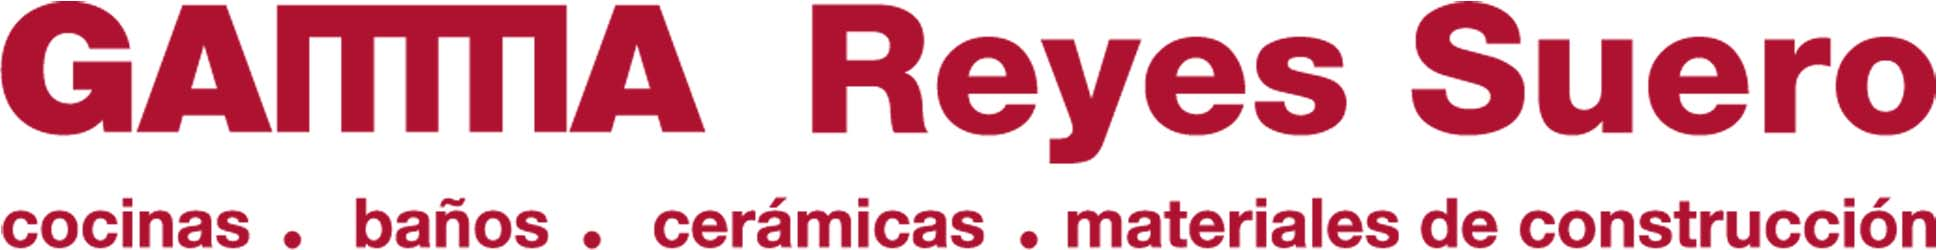 Reyes Suero - Grupo Gamma